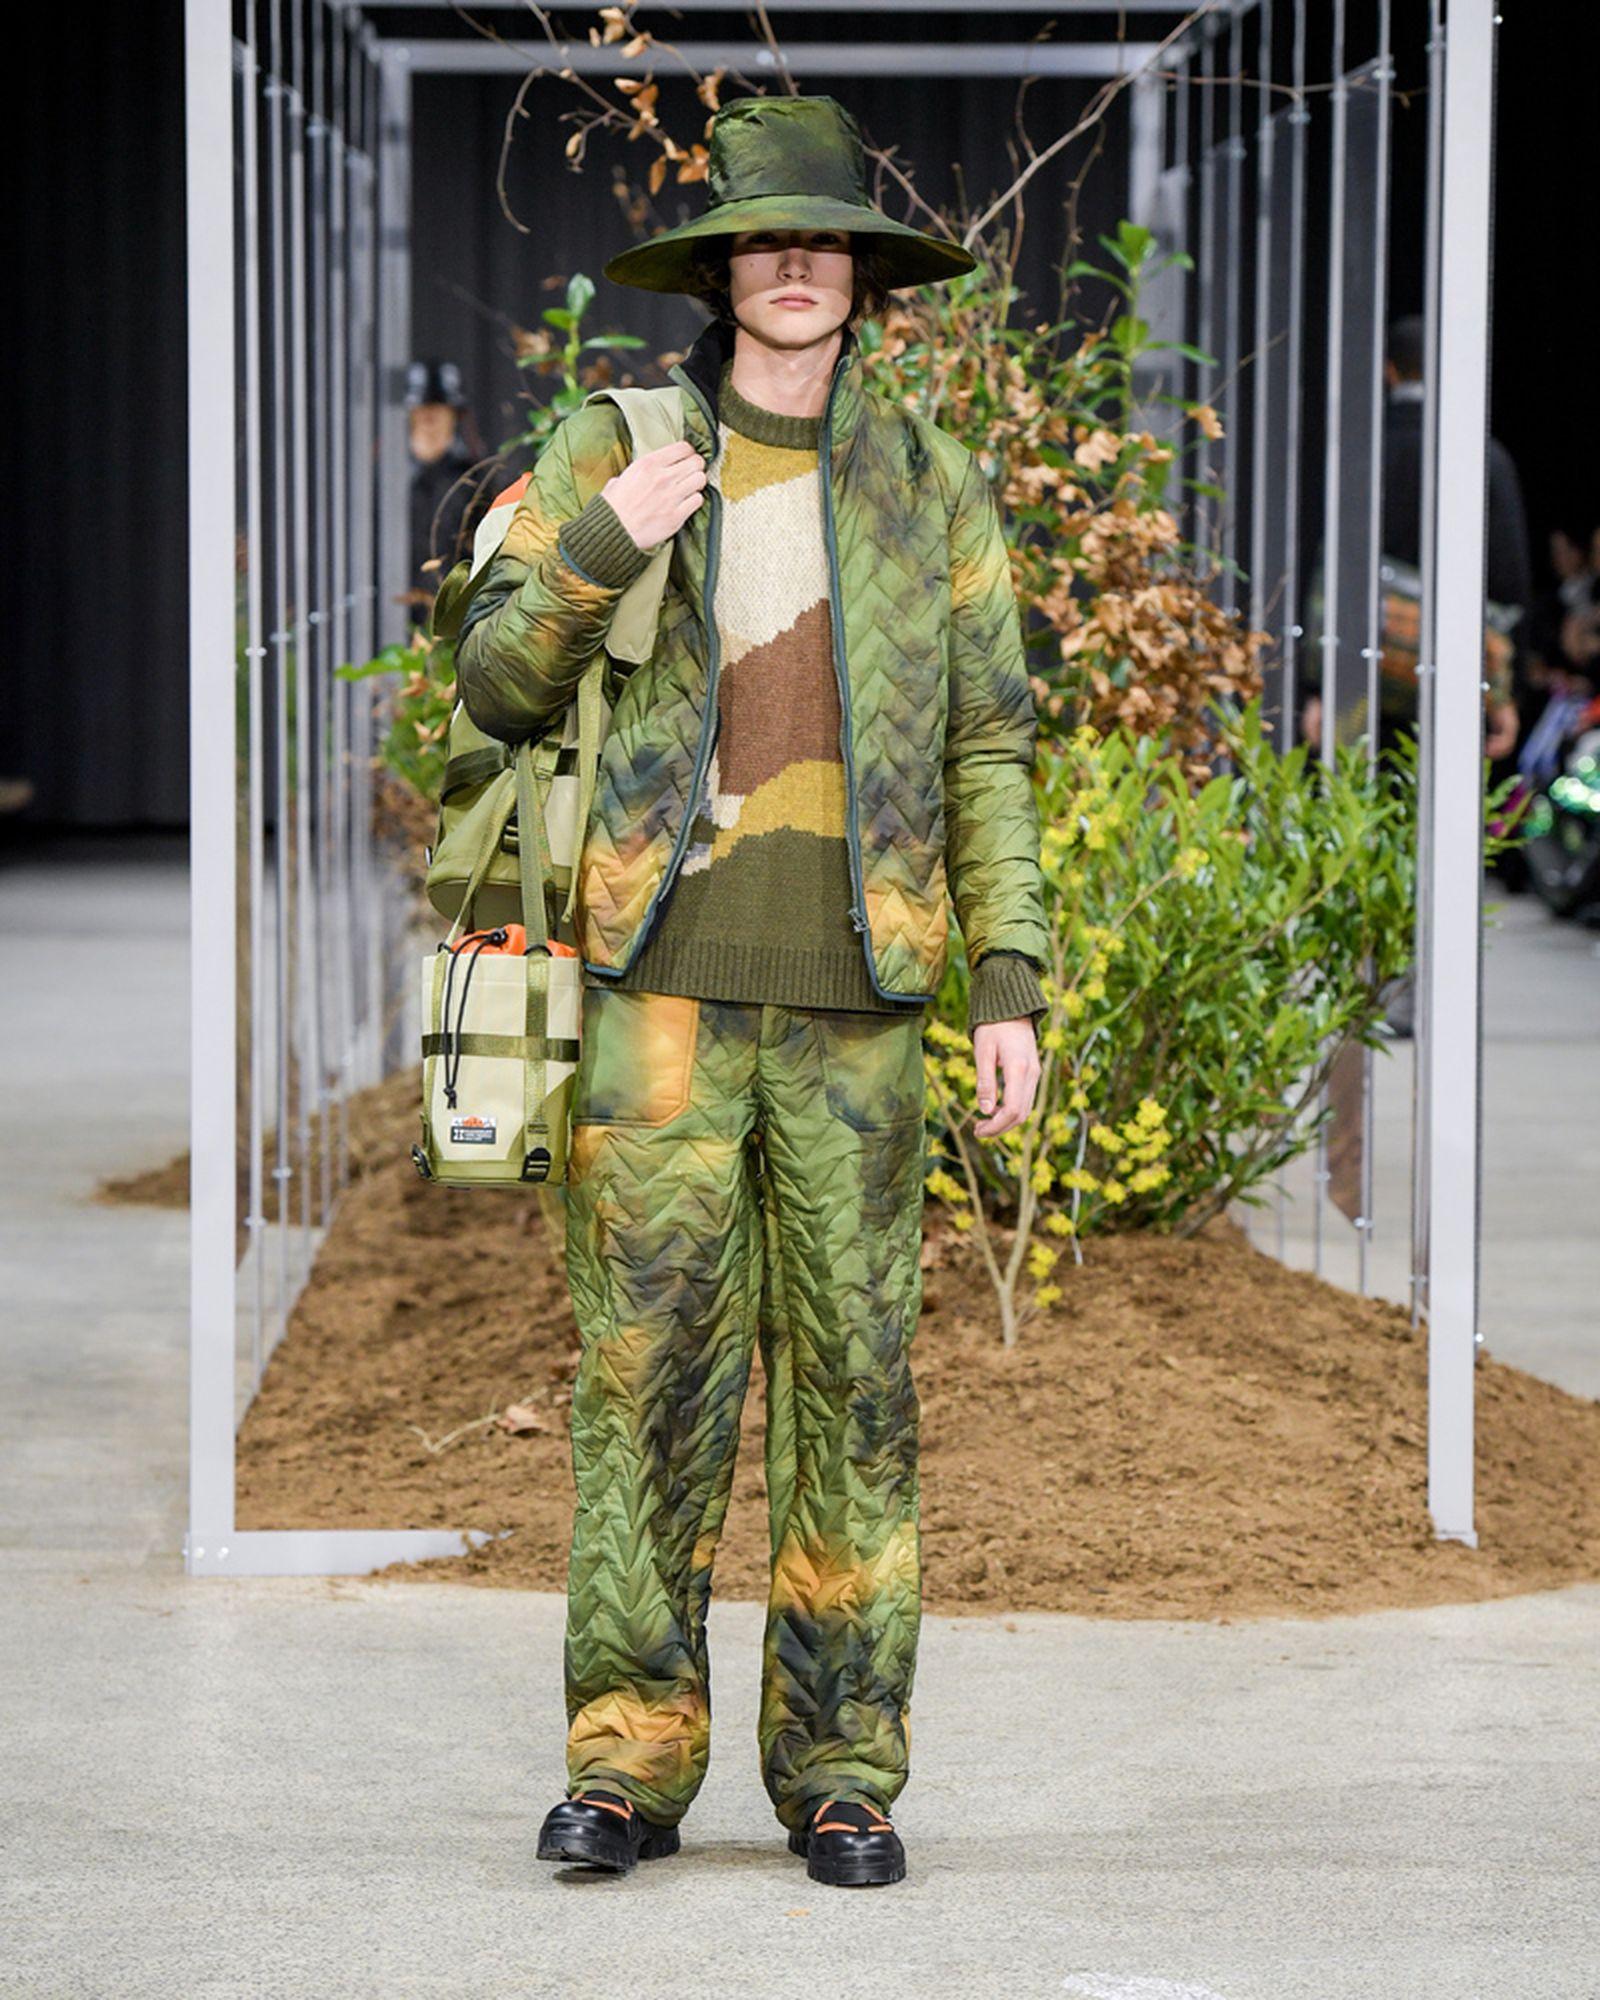 future-fashion-week-copenhagen-holz-6